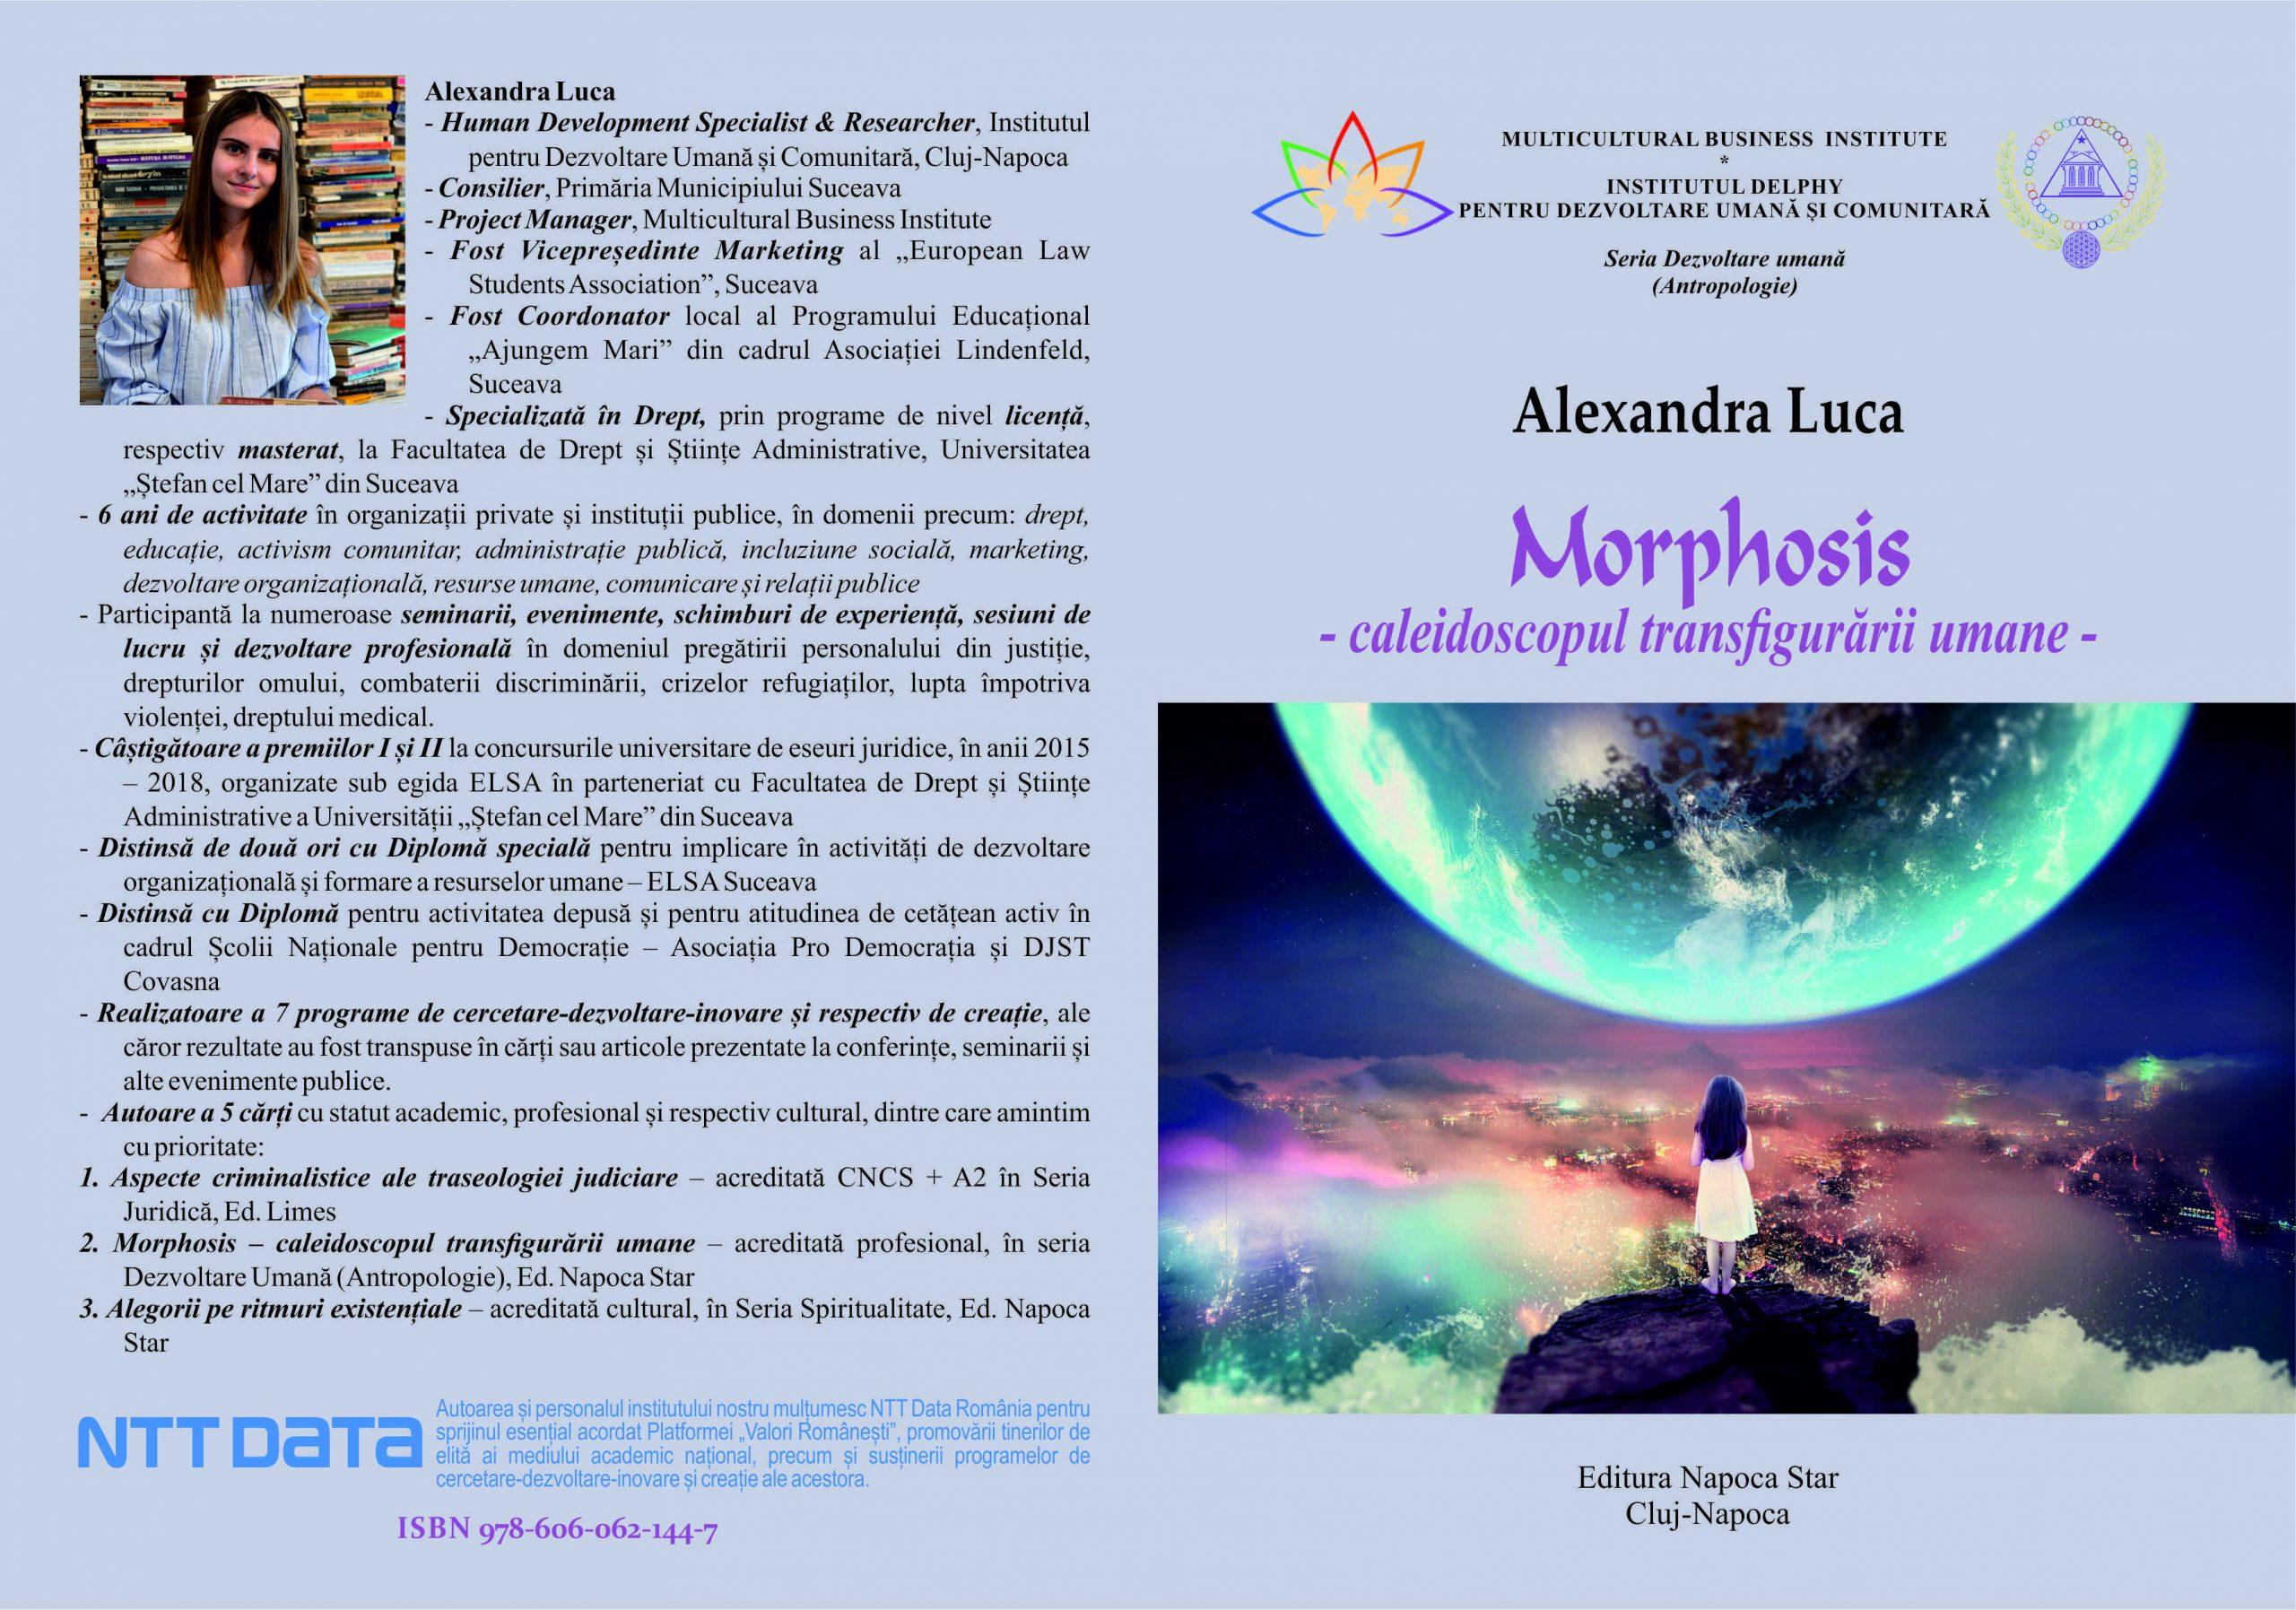 MORPHOSIS - Alexandra Luca